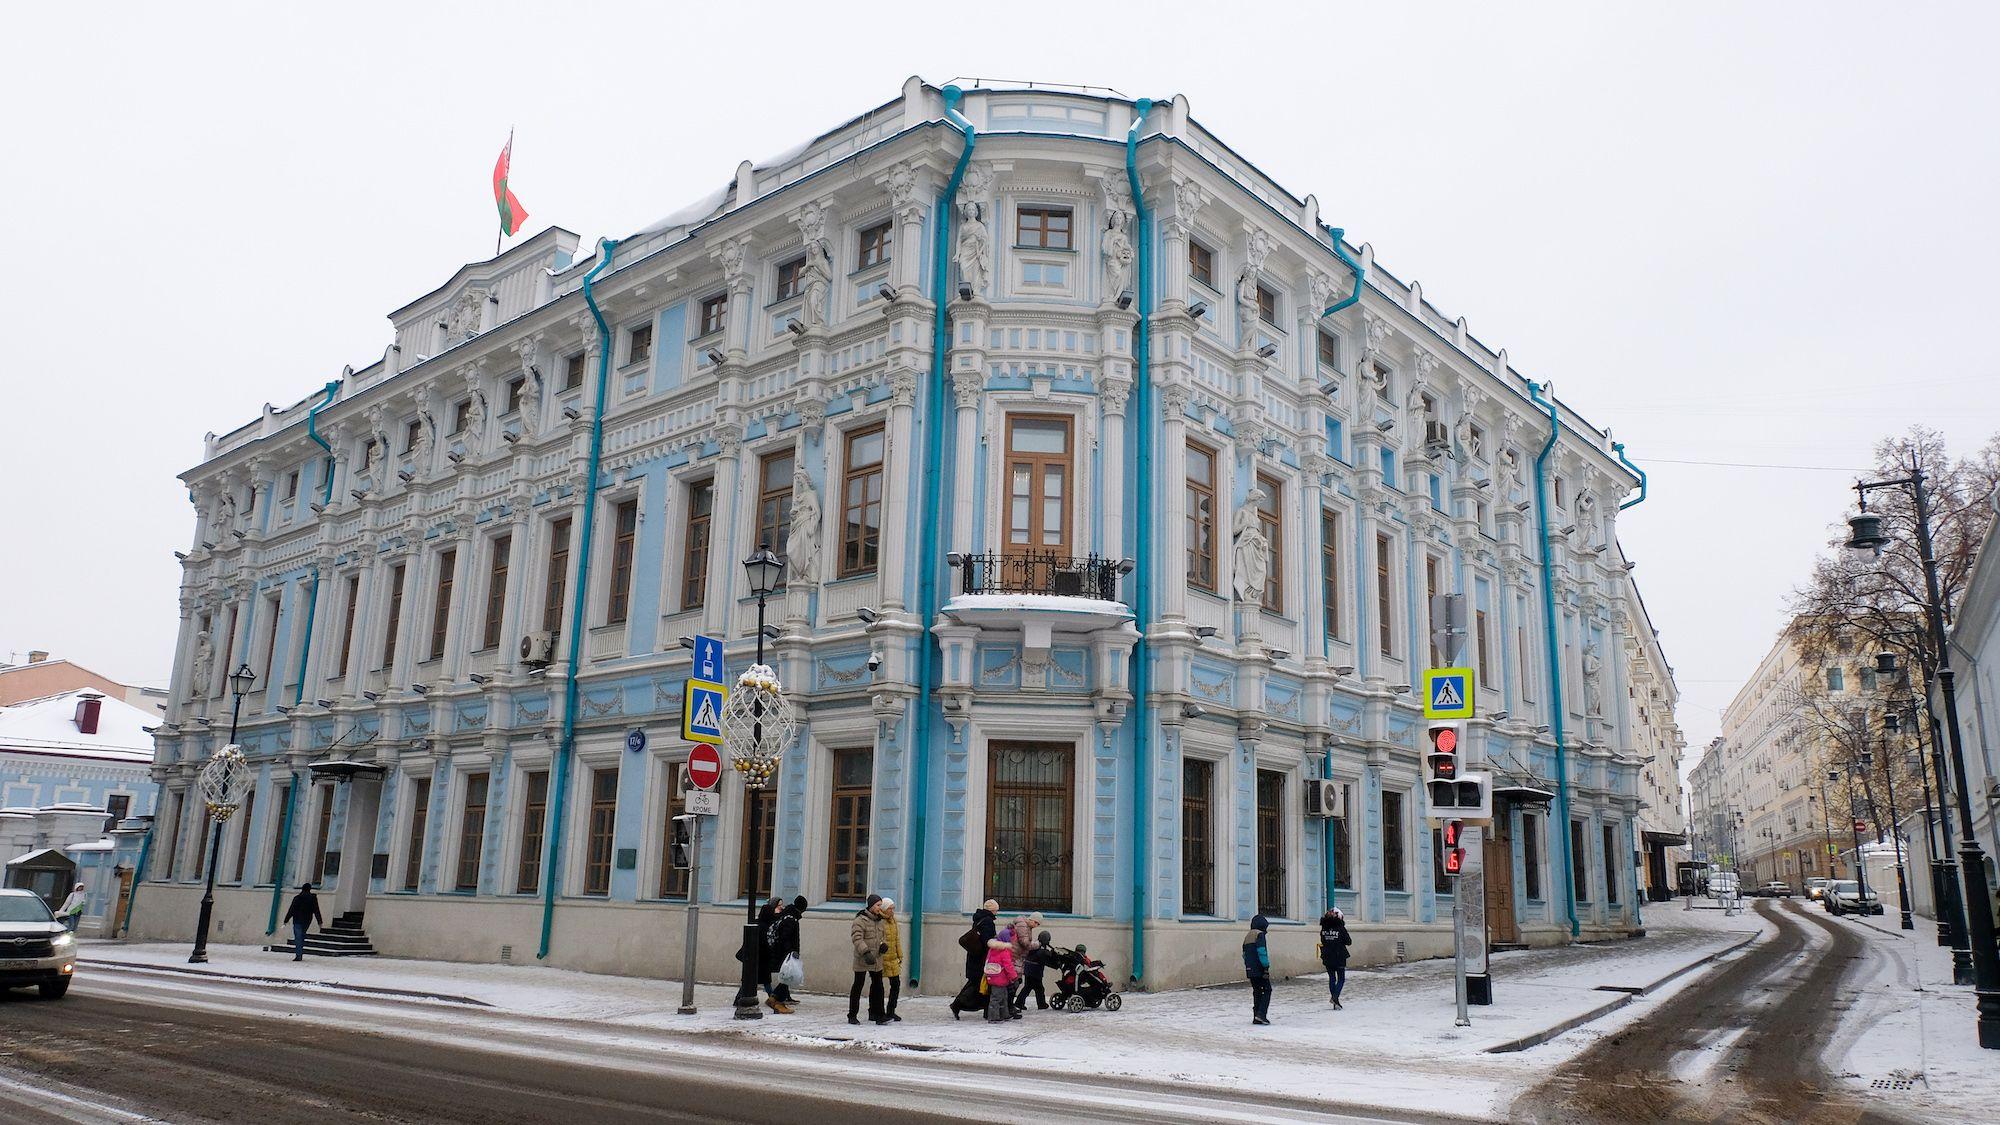 Mosca Ambasciata Bielorussa compressor WEEKEND A MOSCA